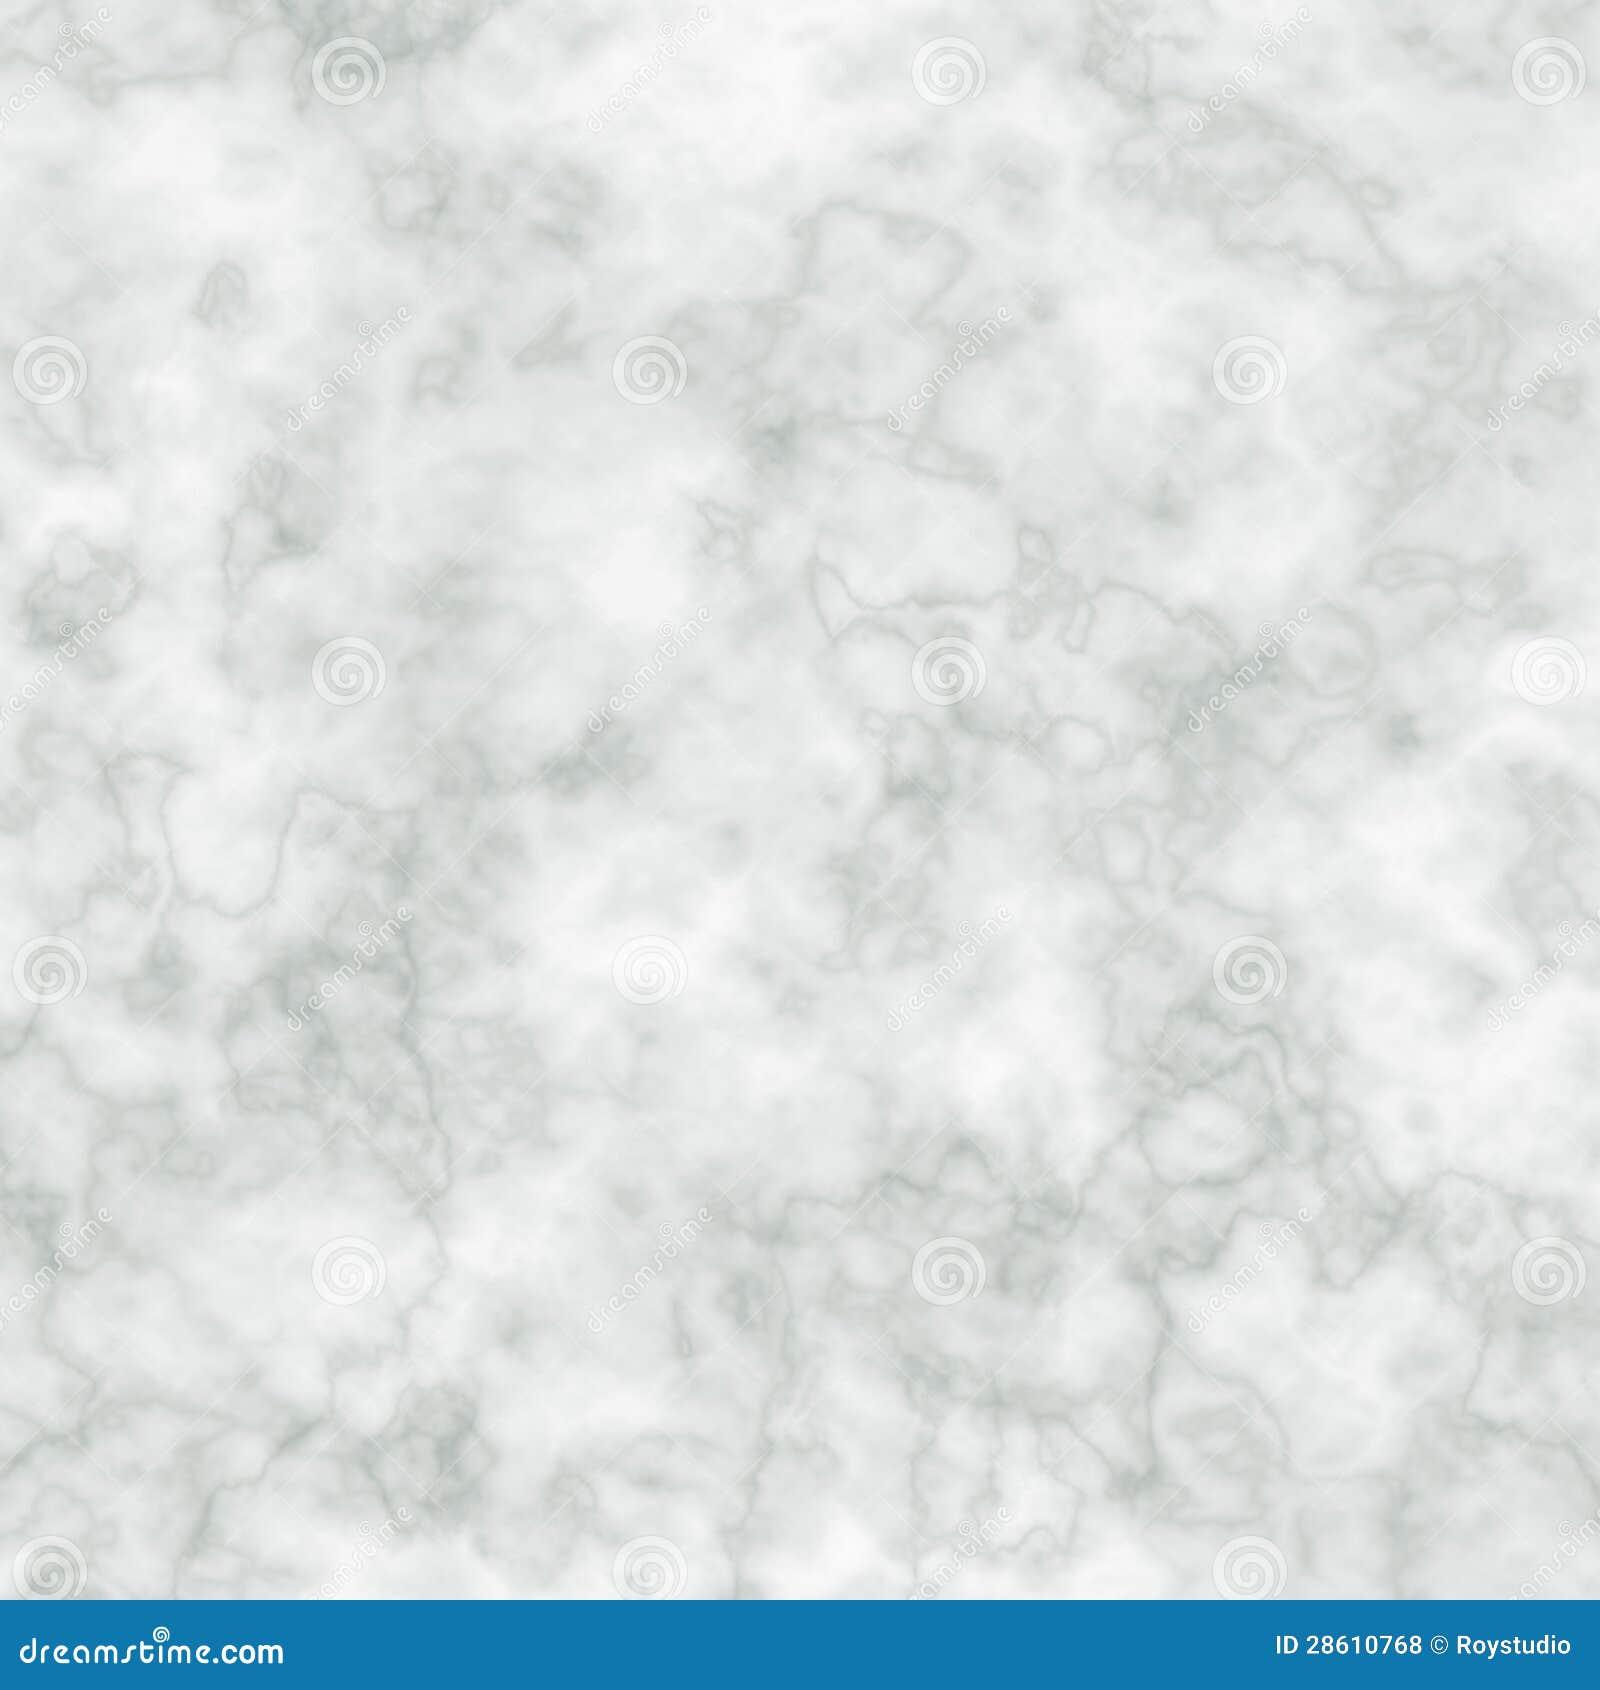 fond blanc de marbre de mur de texture de marbre illustration stock illustration du conception. Black Bedroom Furniture Sets. Home Design Ideas